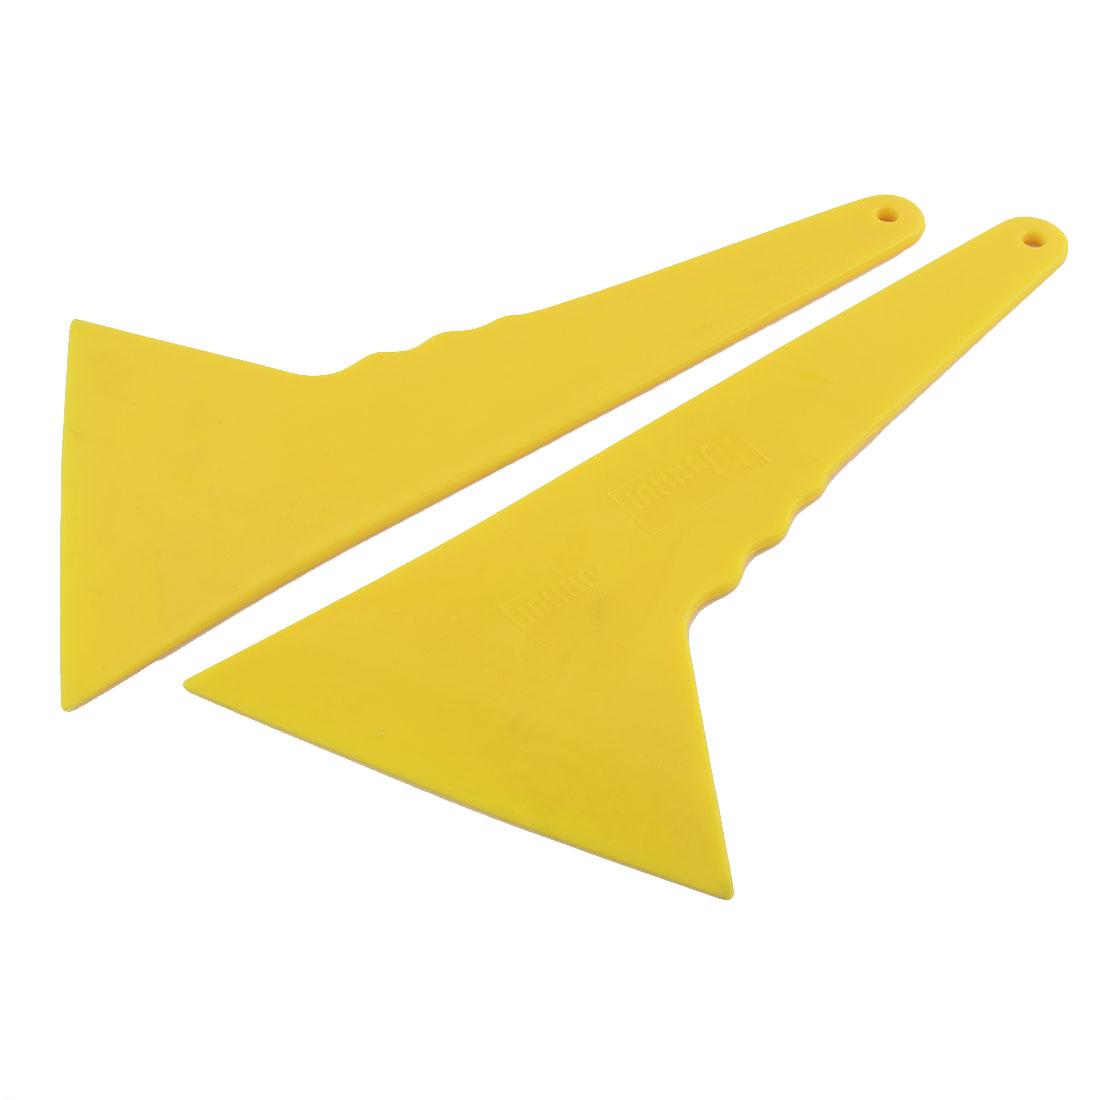 Household Plastic Handle Smooth Corners Cars Glass Wall Scraper Tool Yellow 2PCS